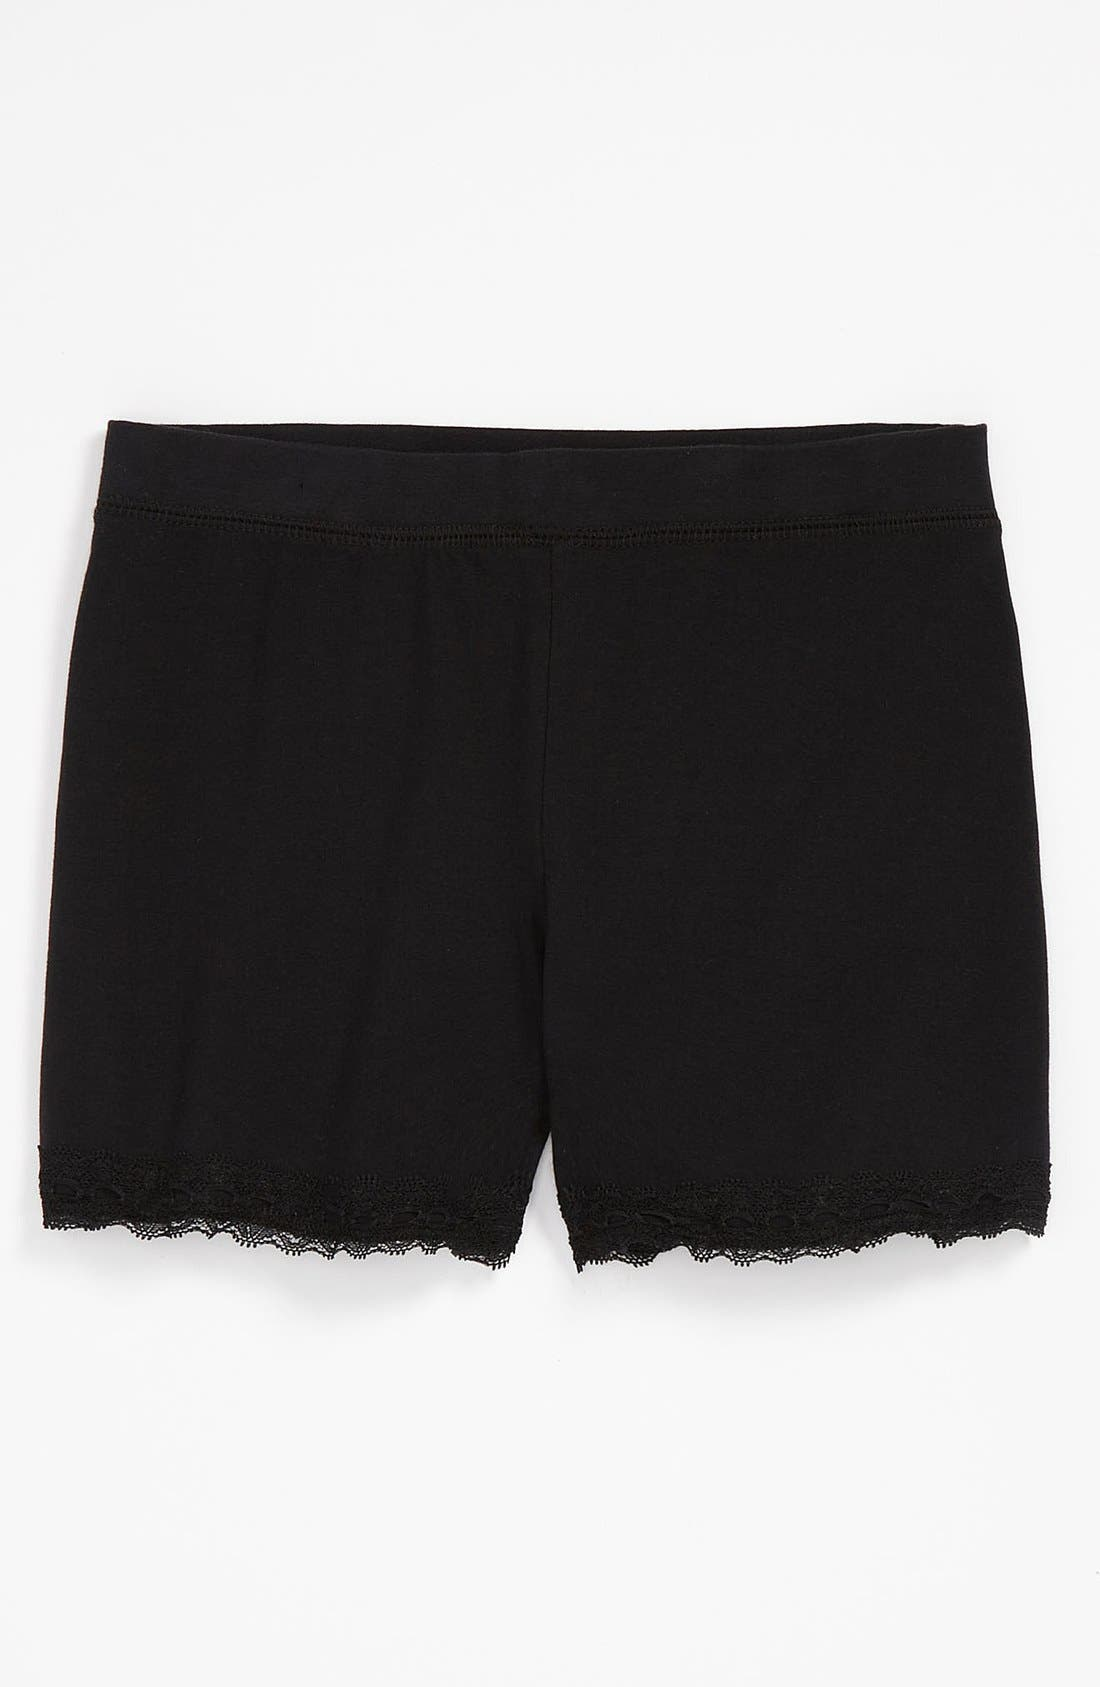 Alternate Image 1 Selected - Tucker + Tate Lace Trim Shorts (Little Girls & Big Girls)